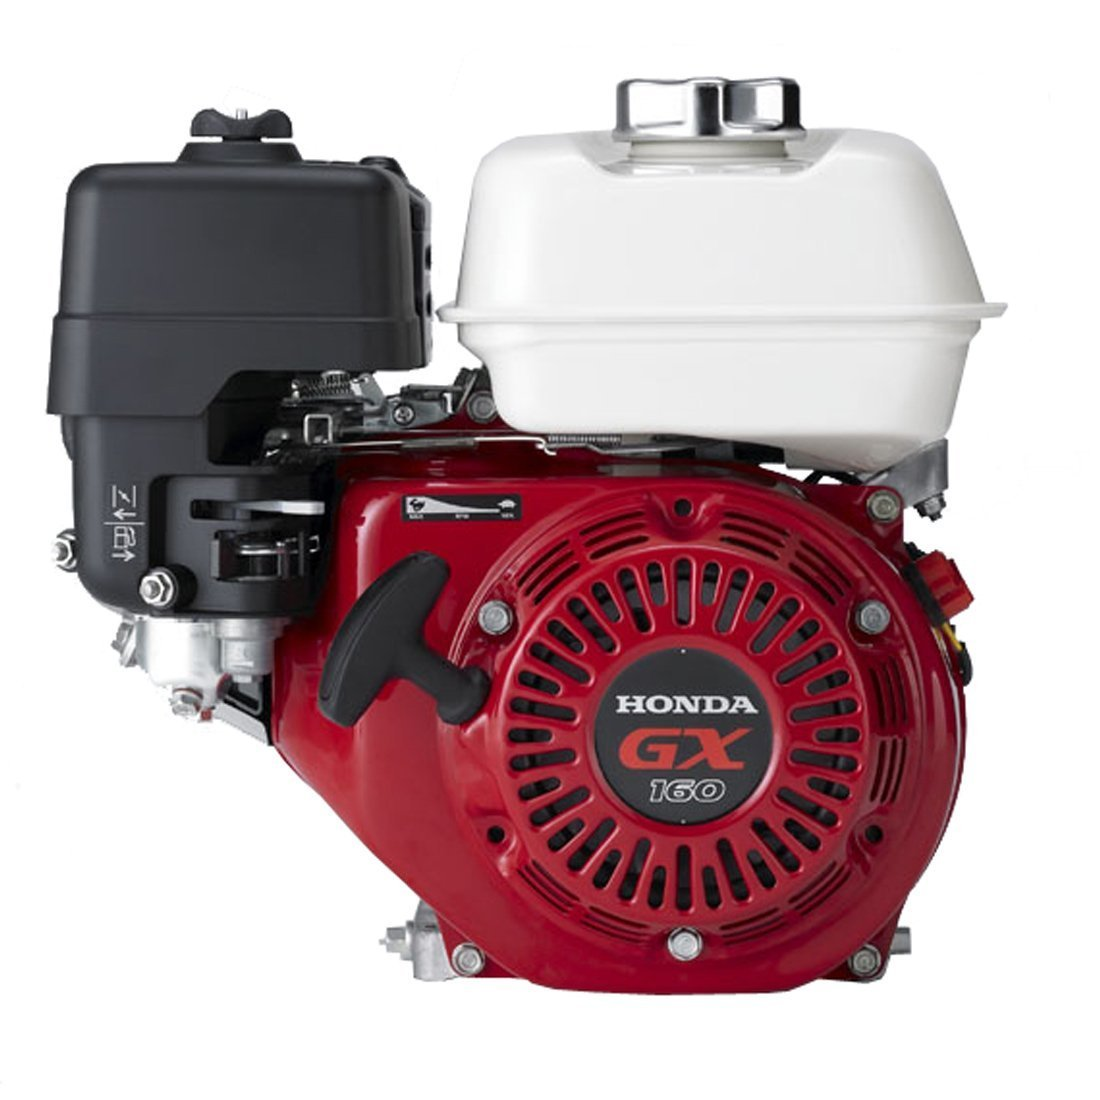 Honda Gx140 Governor Linkage Diagram General Purpose Engine Brand New Garden Outdoor 1100x1100